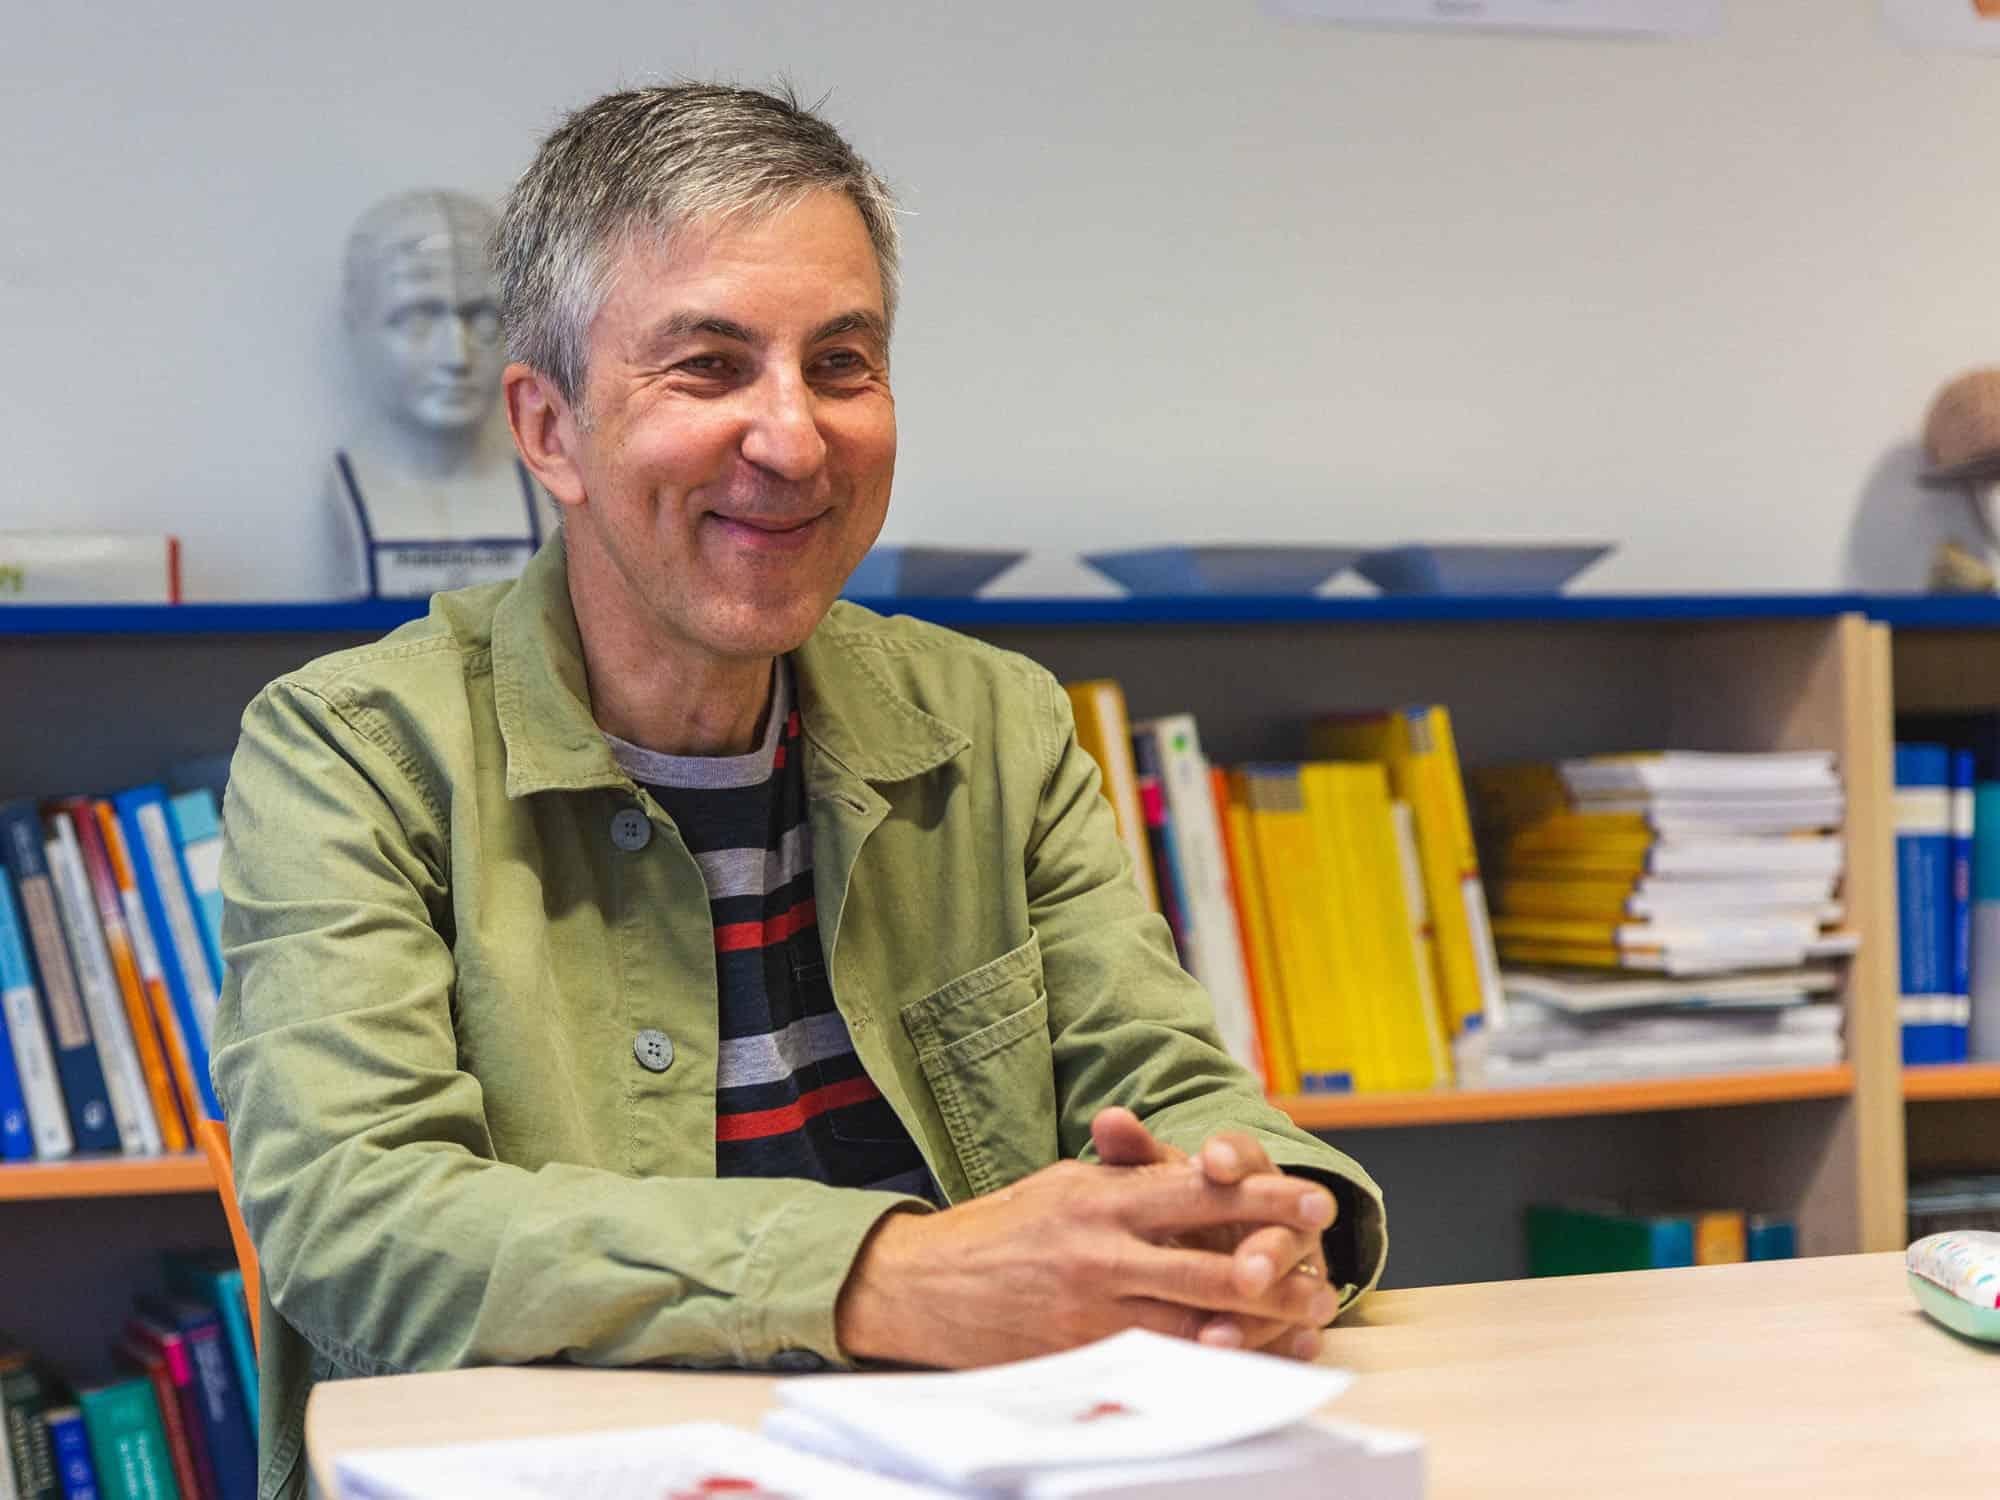 Prof. Dr. Gunther Moll